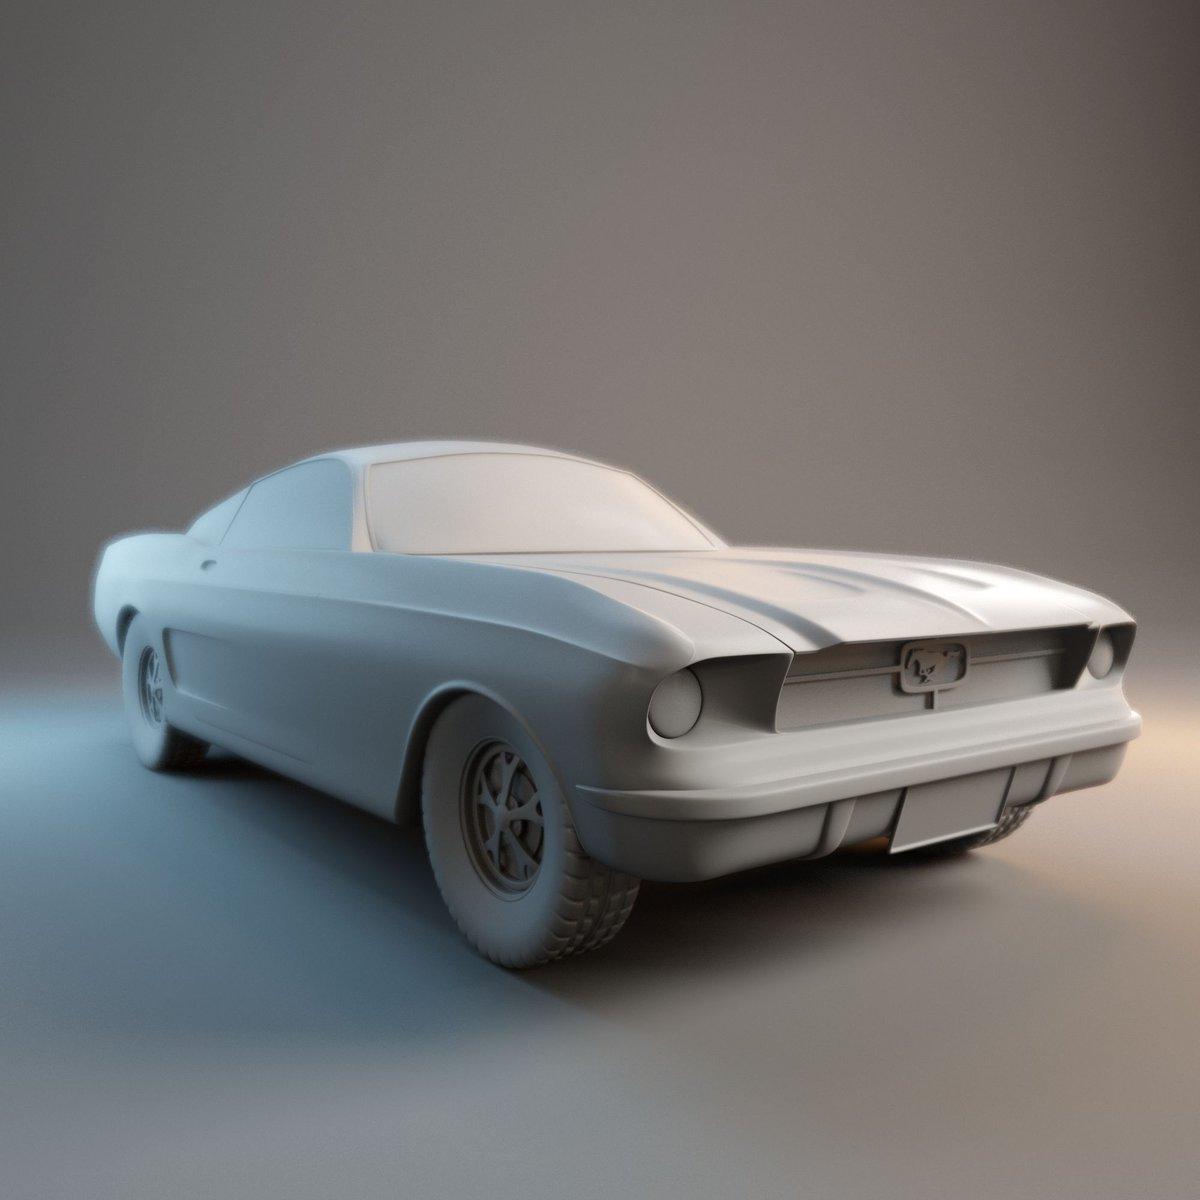 Car modeling, not great not terrible ( I hope) :) #car #maya #autodeskmaya #maya3d #redshift3d #redshift #redshiftrender #render #digitalart #cgi #cg #3d #3dart #3ddesign #digital3d #digital #digitalartist #instaart #modeling